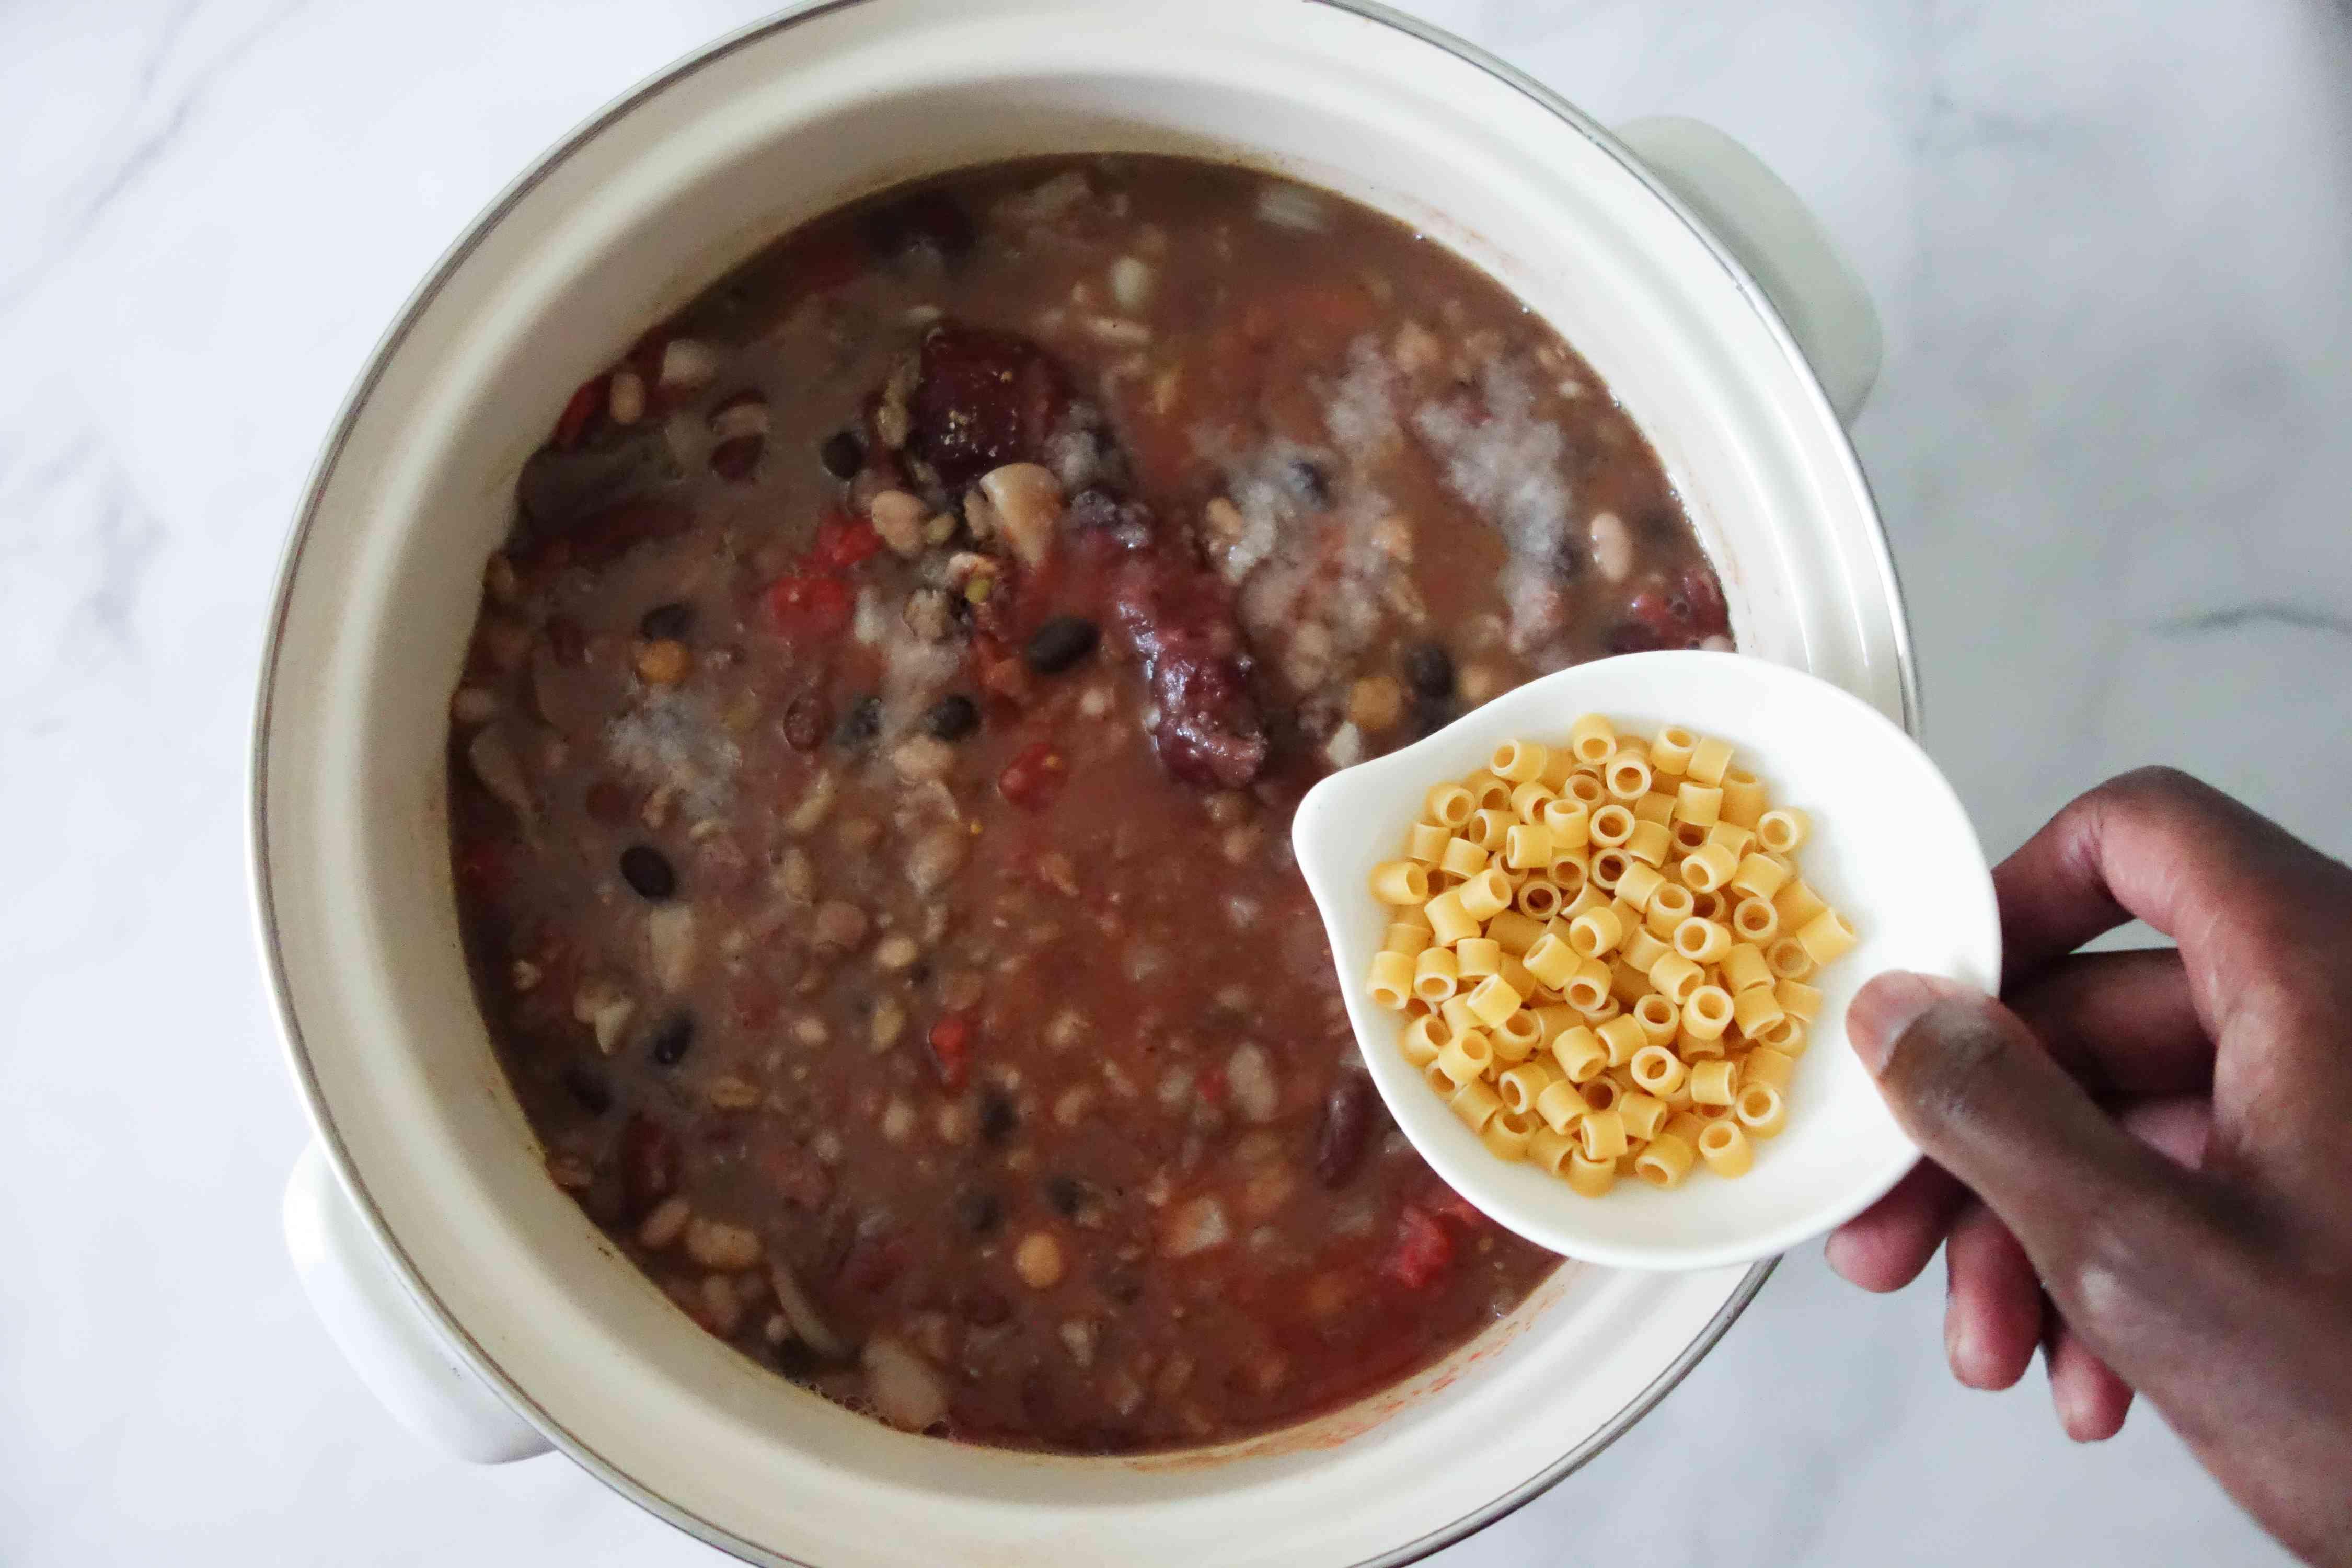 Stir salt and pasta into the 9-bean soup